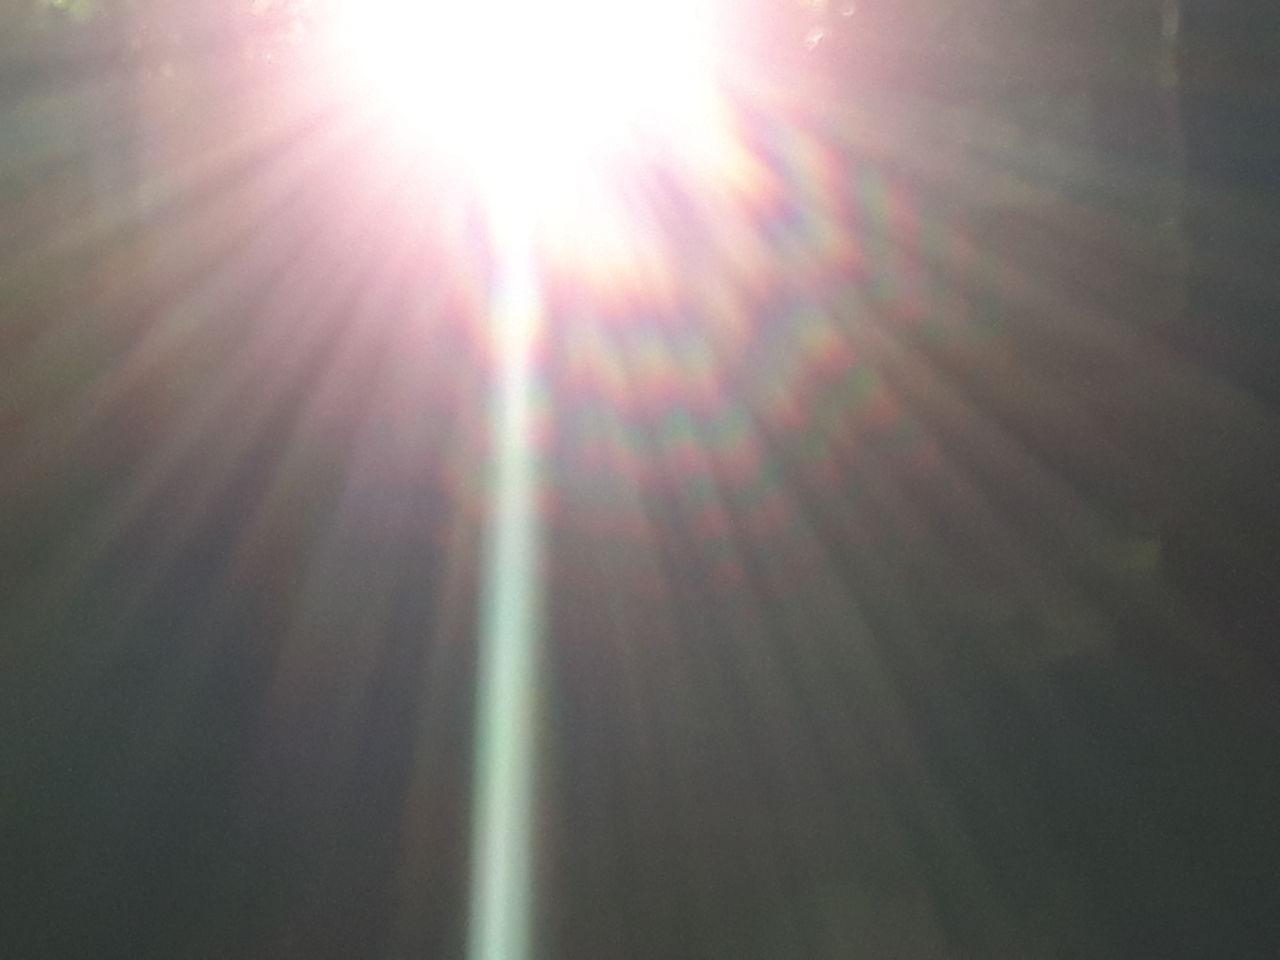 sunbeam, sunlight, sun, no people, backgrounds, day, indoors, nature, beauty in nature, refraction, spectrum